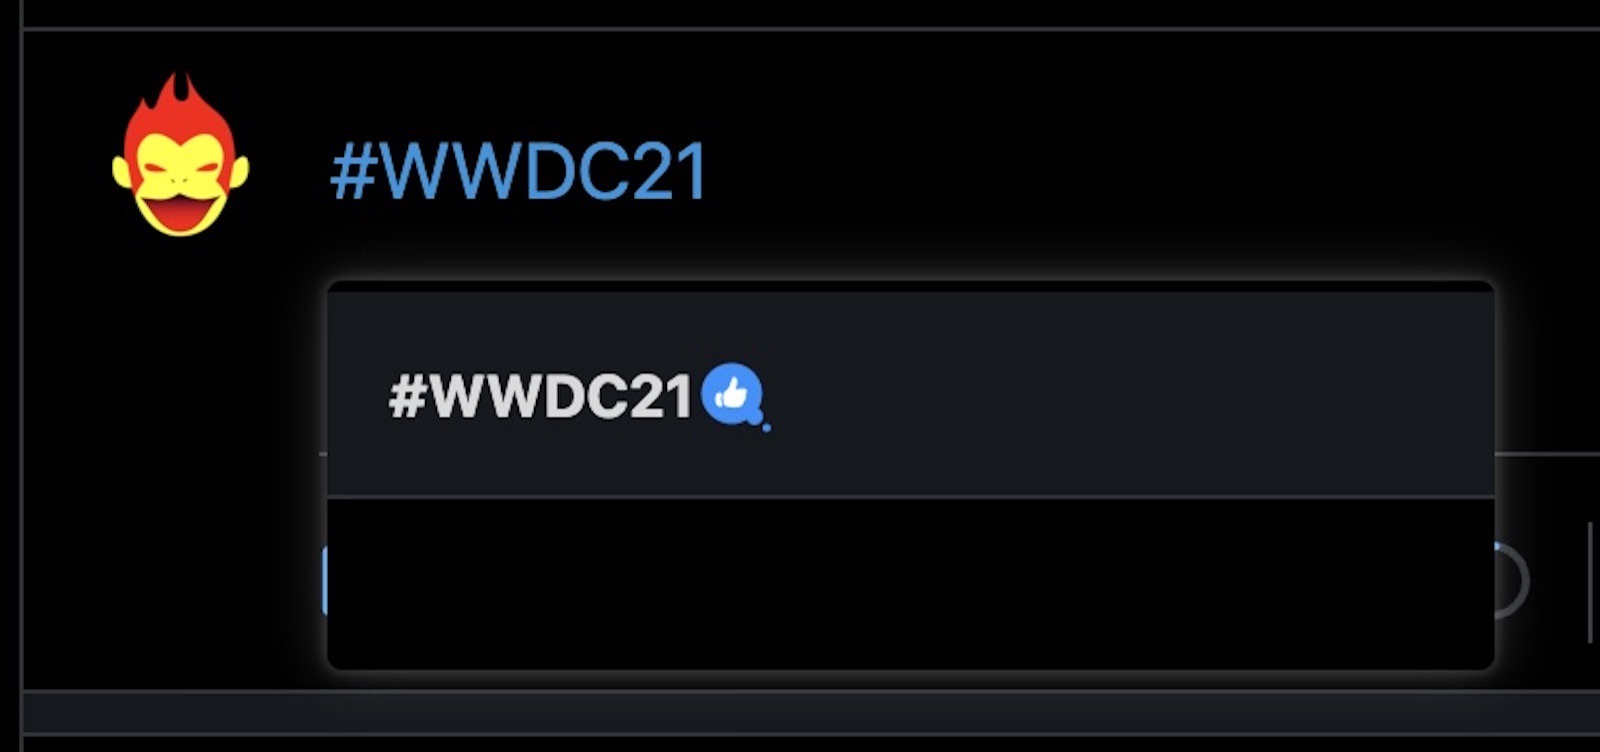 Wwdc 2021 hashtag